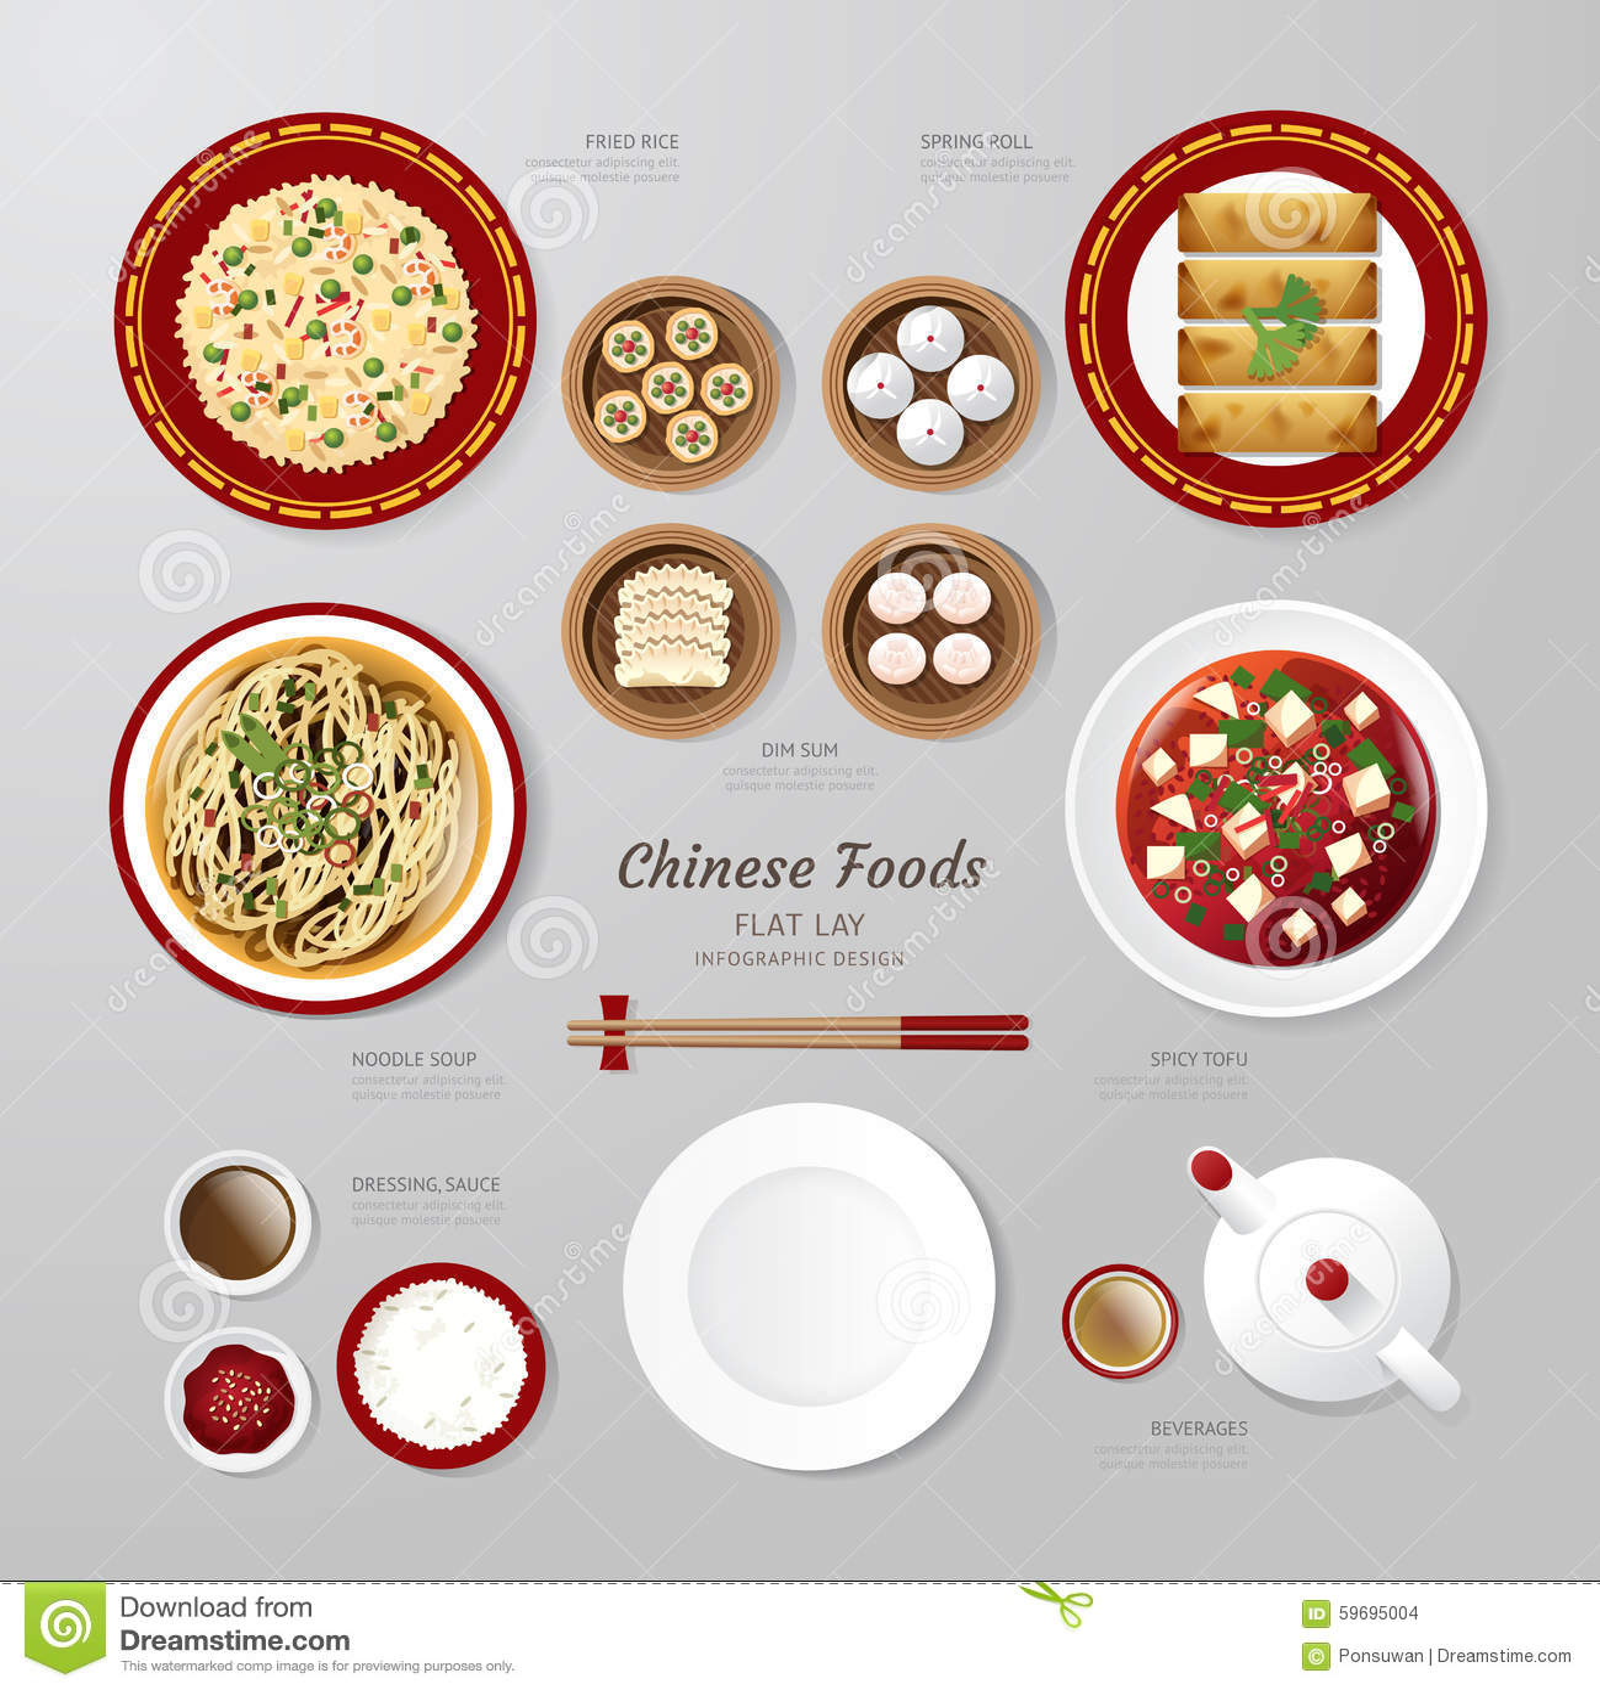 Infographic China foods business flat lay idea. Vector illustrat